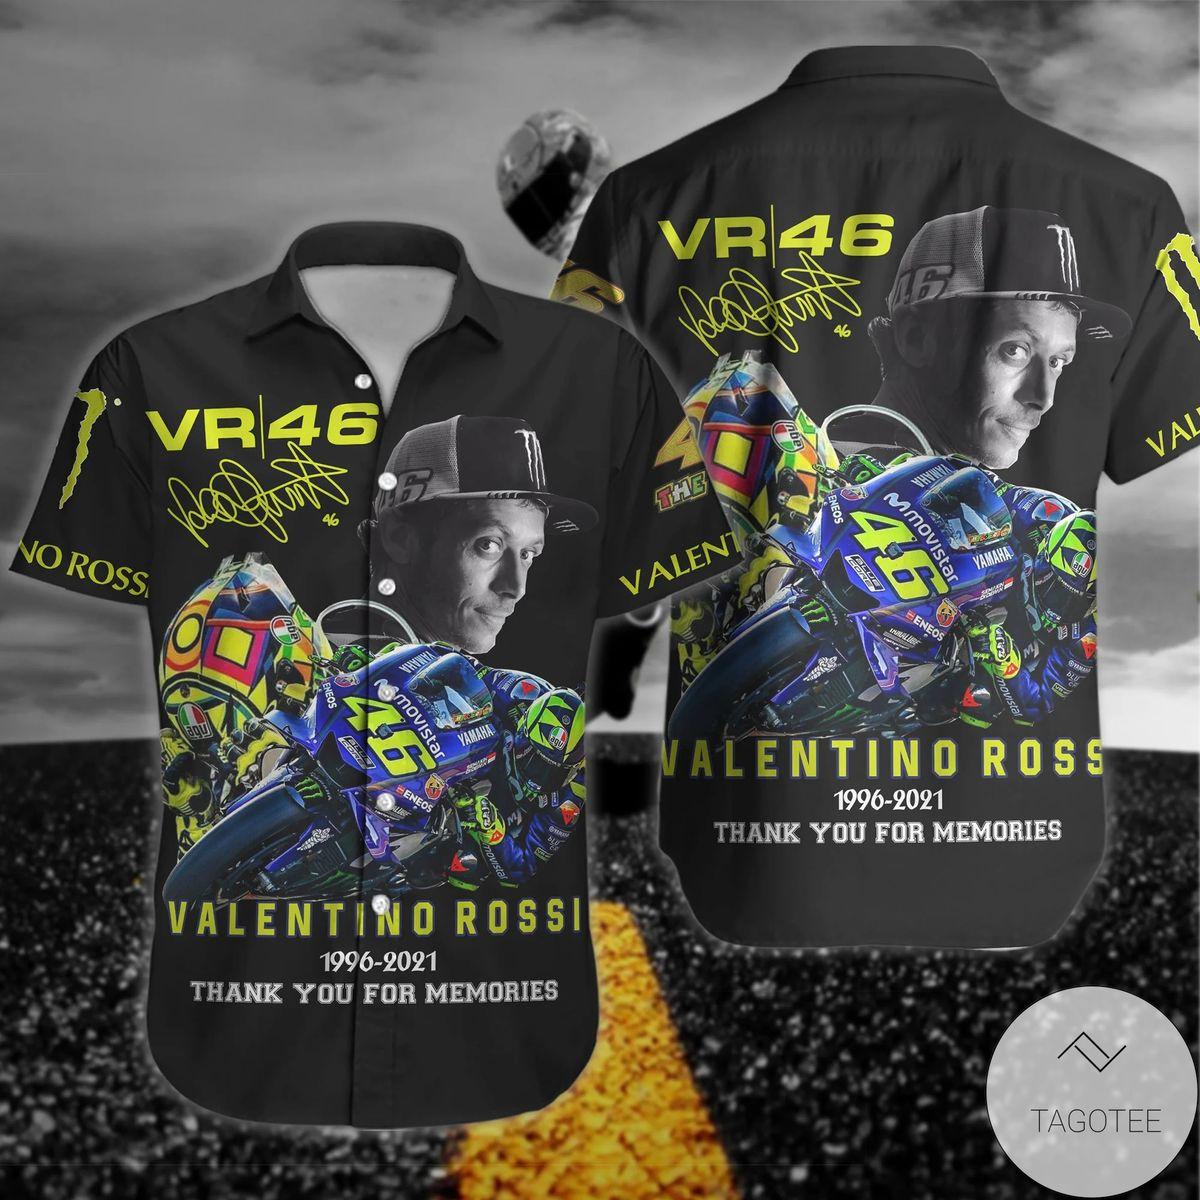 Valentino Rossi Vr46 1996-2021 Hawaiian Shirt